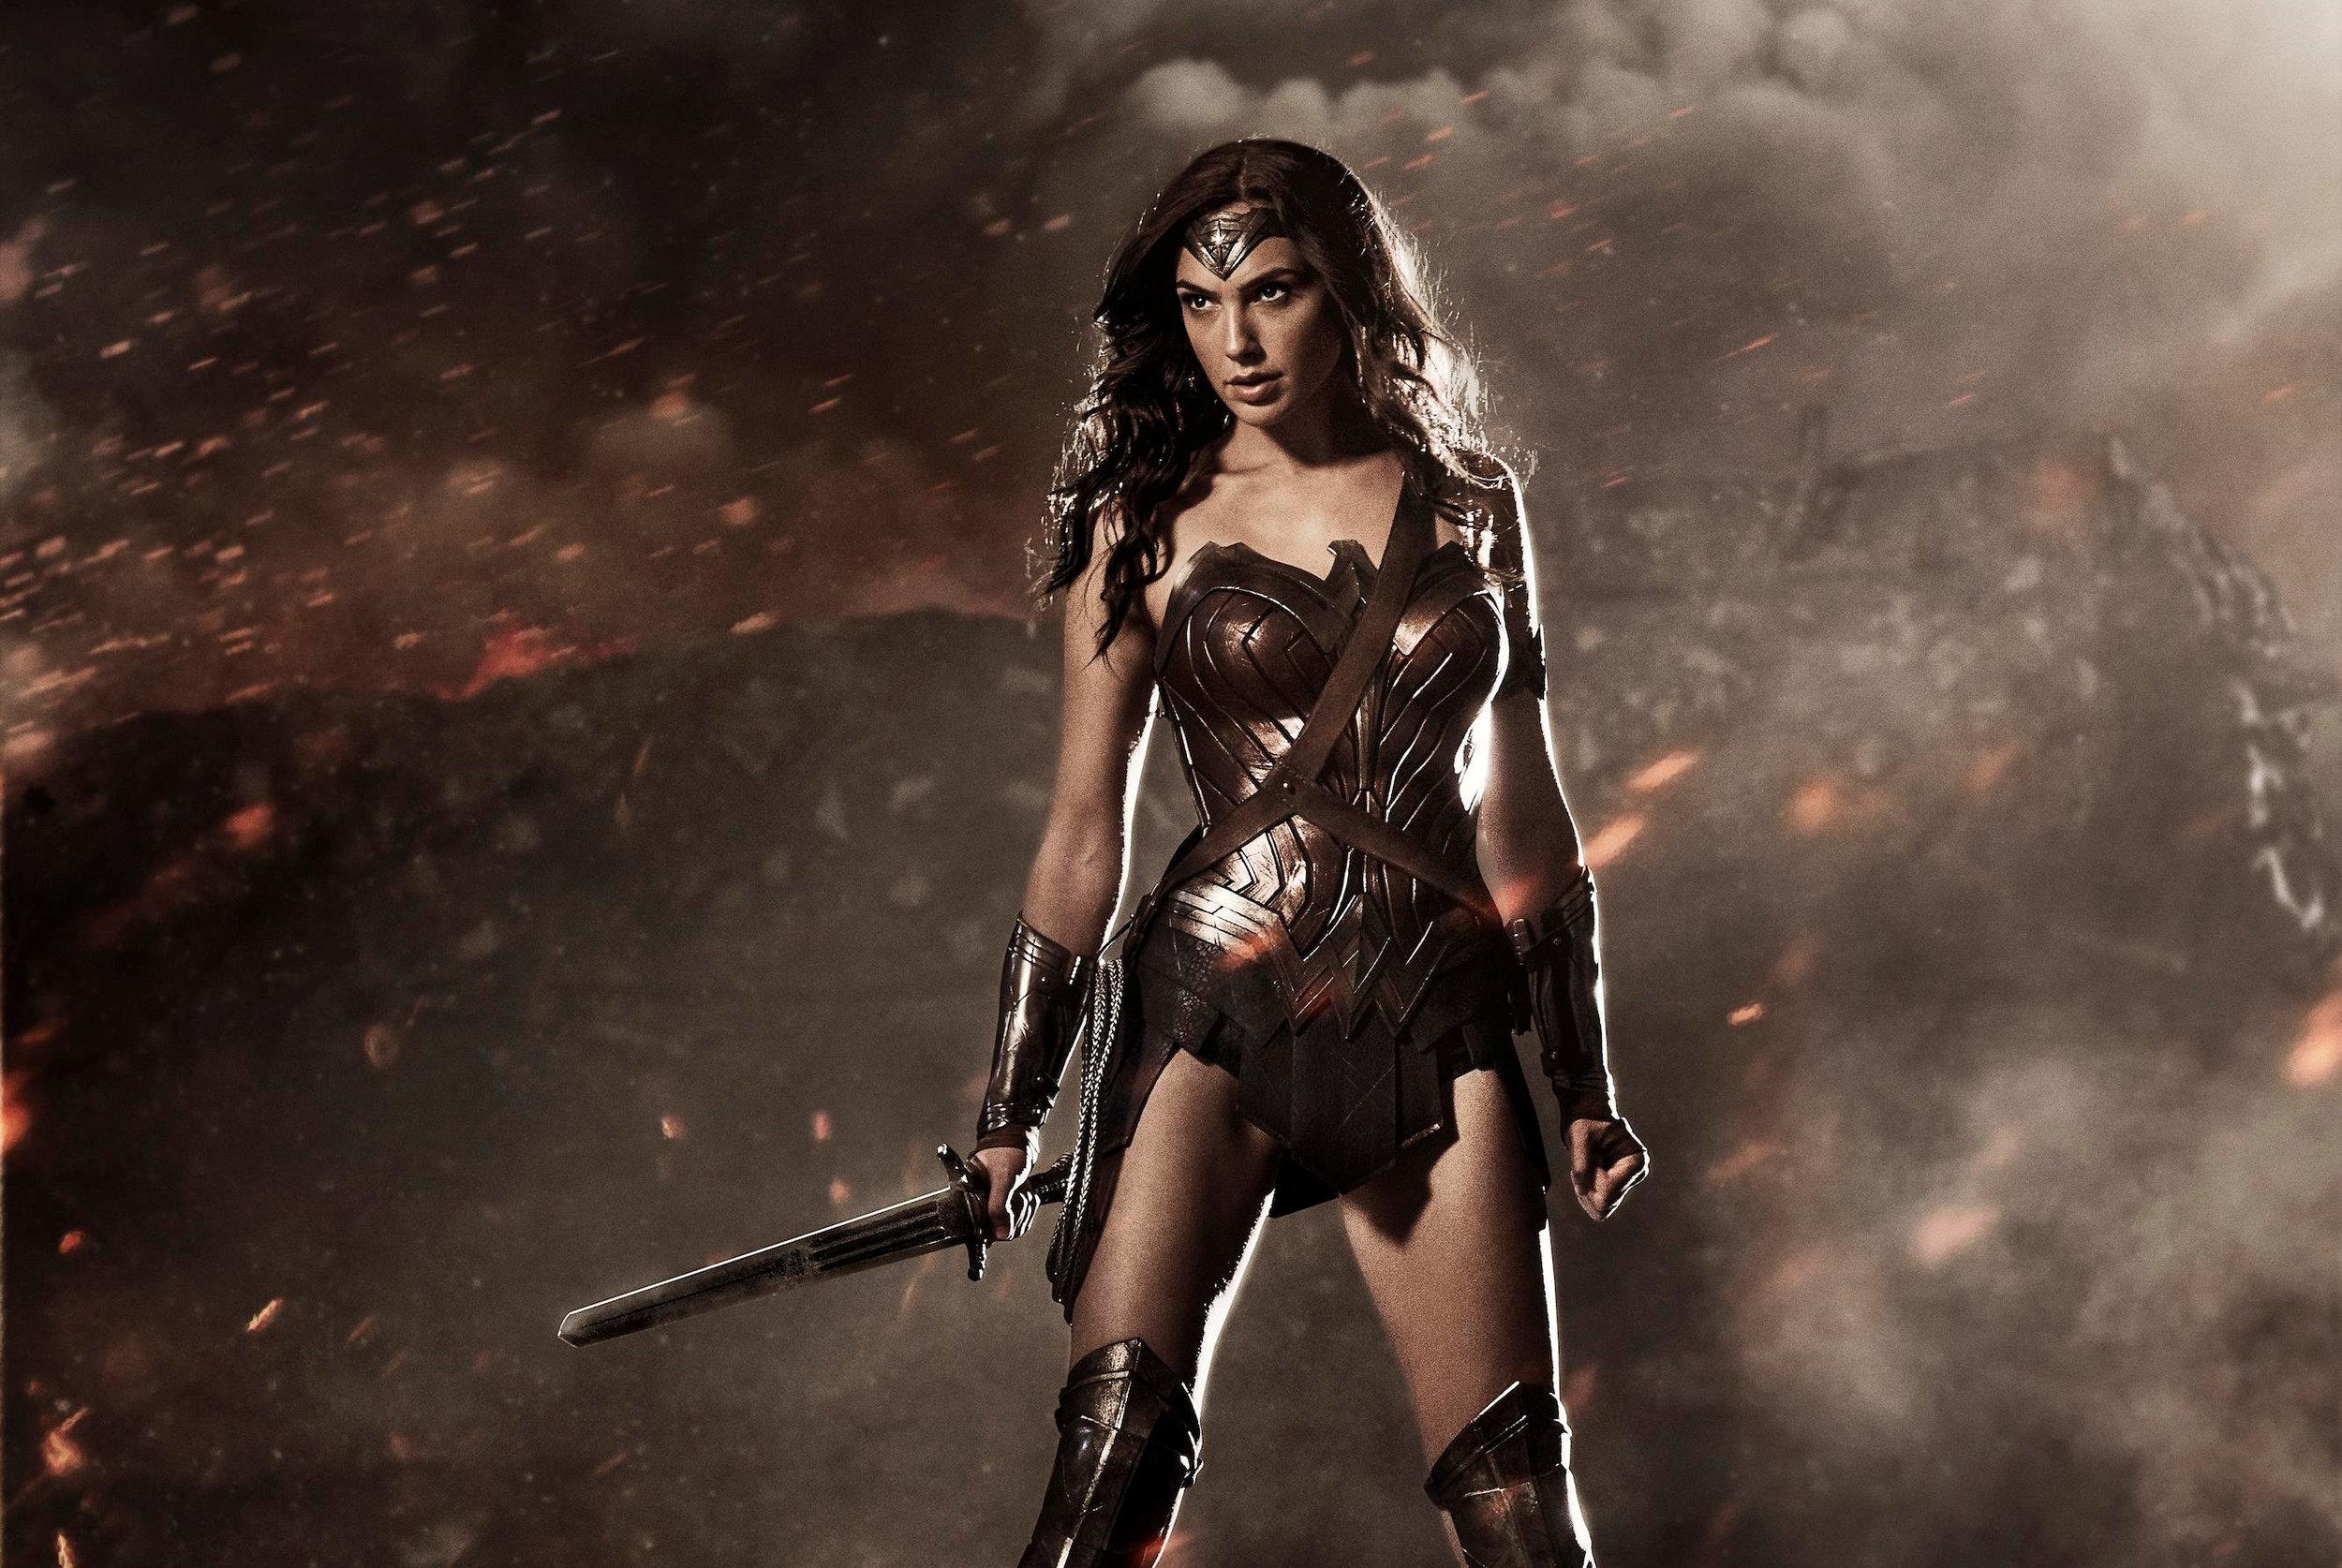 Still Gal Gadot as Wonder Woman